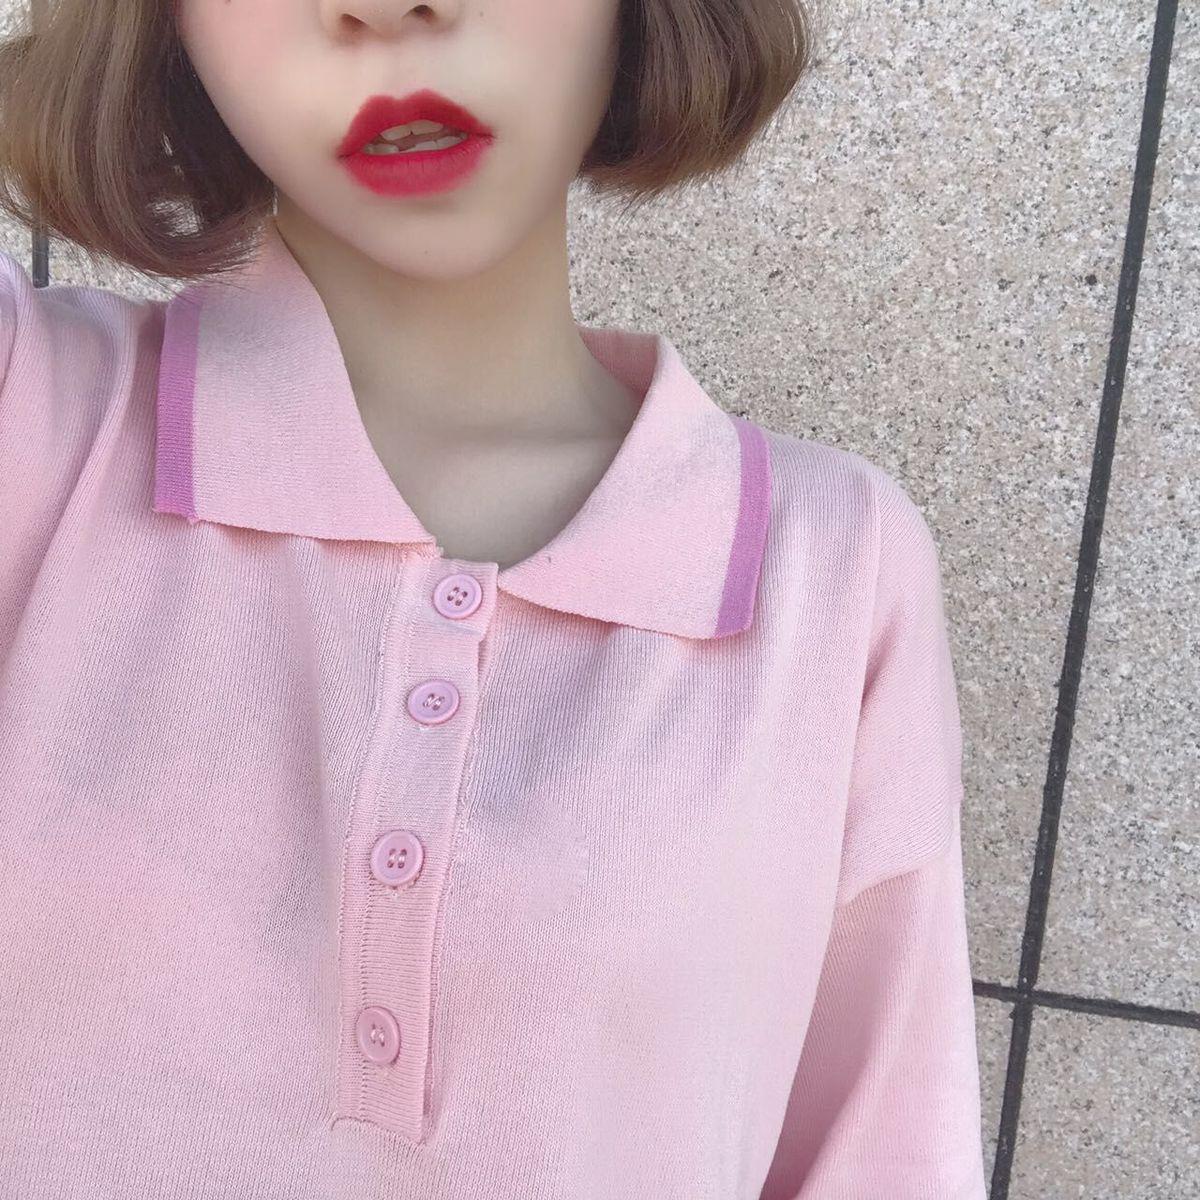 Verano Negro Rosa Vestido de Punto Camiseta Simple Kawaii Chica Mini ...